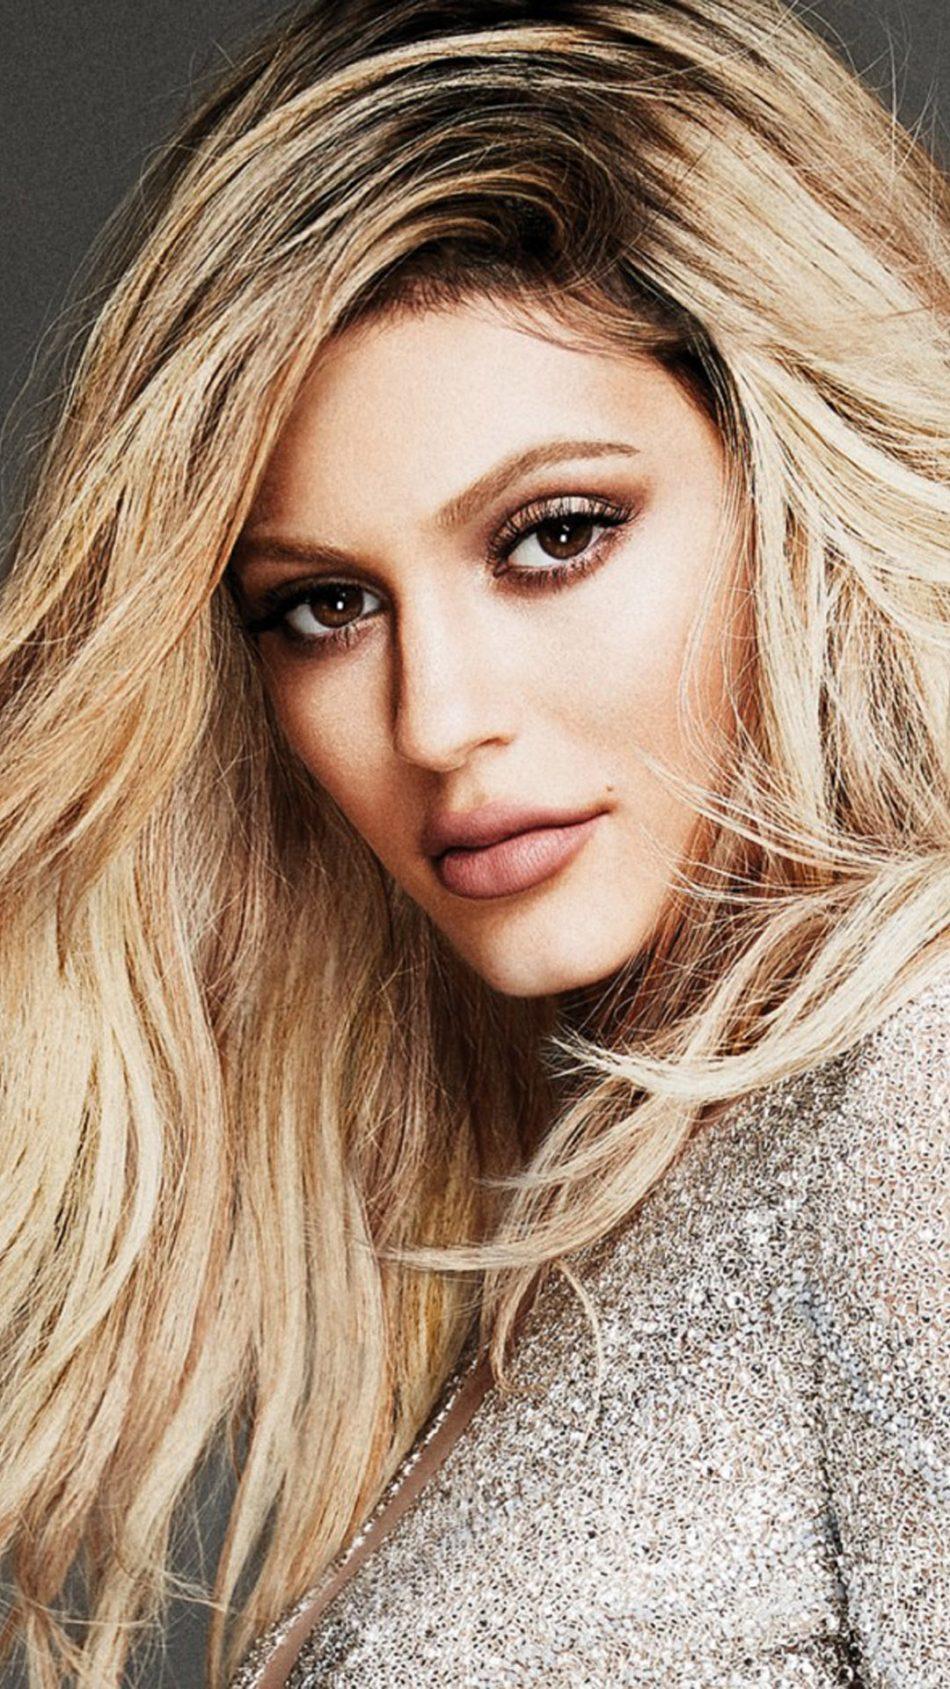 Kylie Jenner Elle Canada Photoshoot Free 4K Ultra HD ...